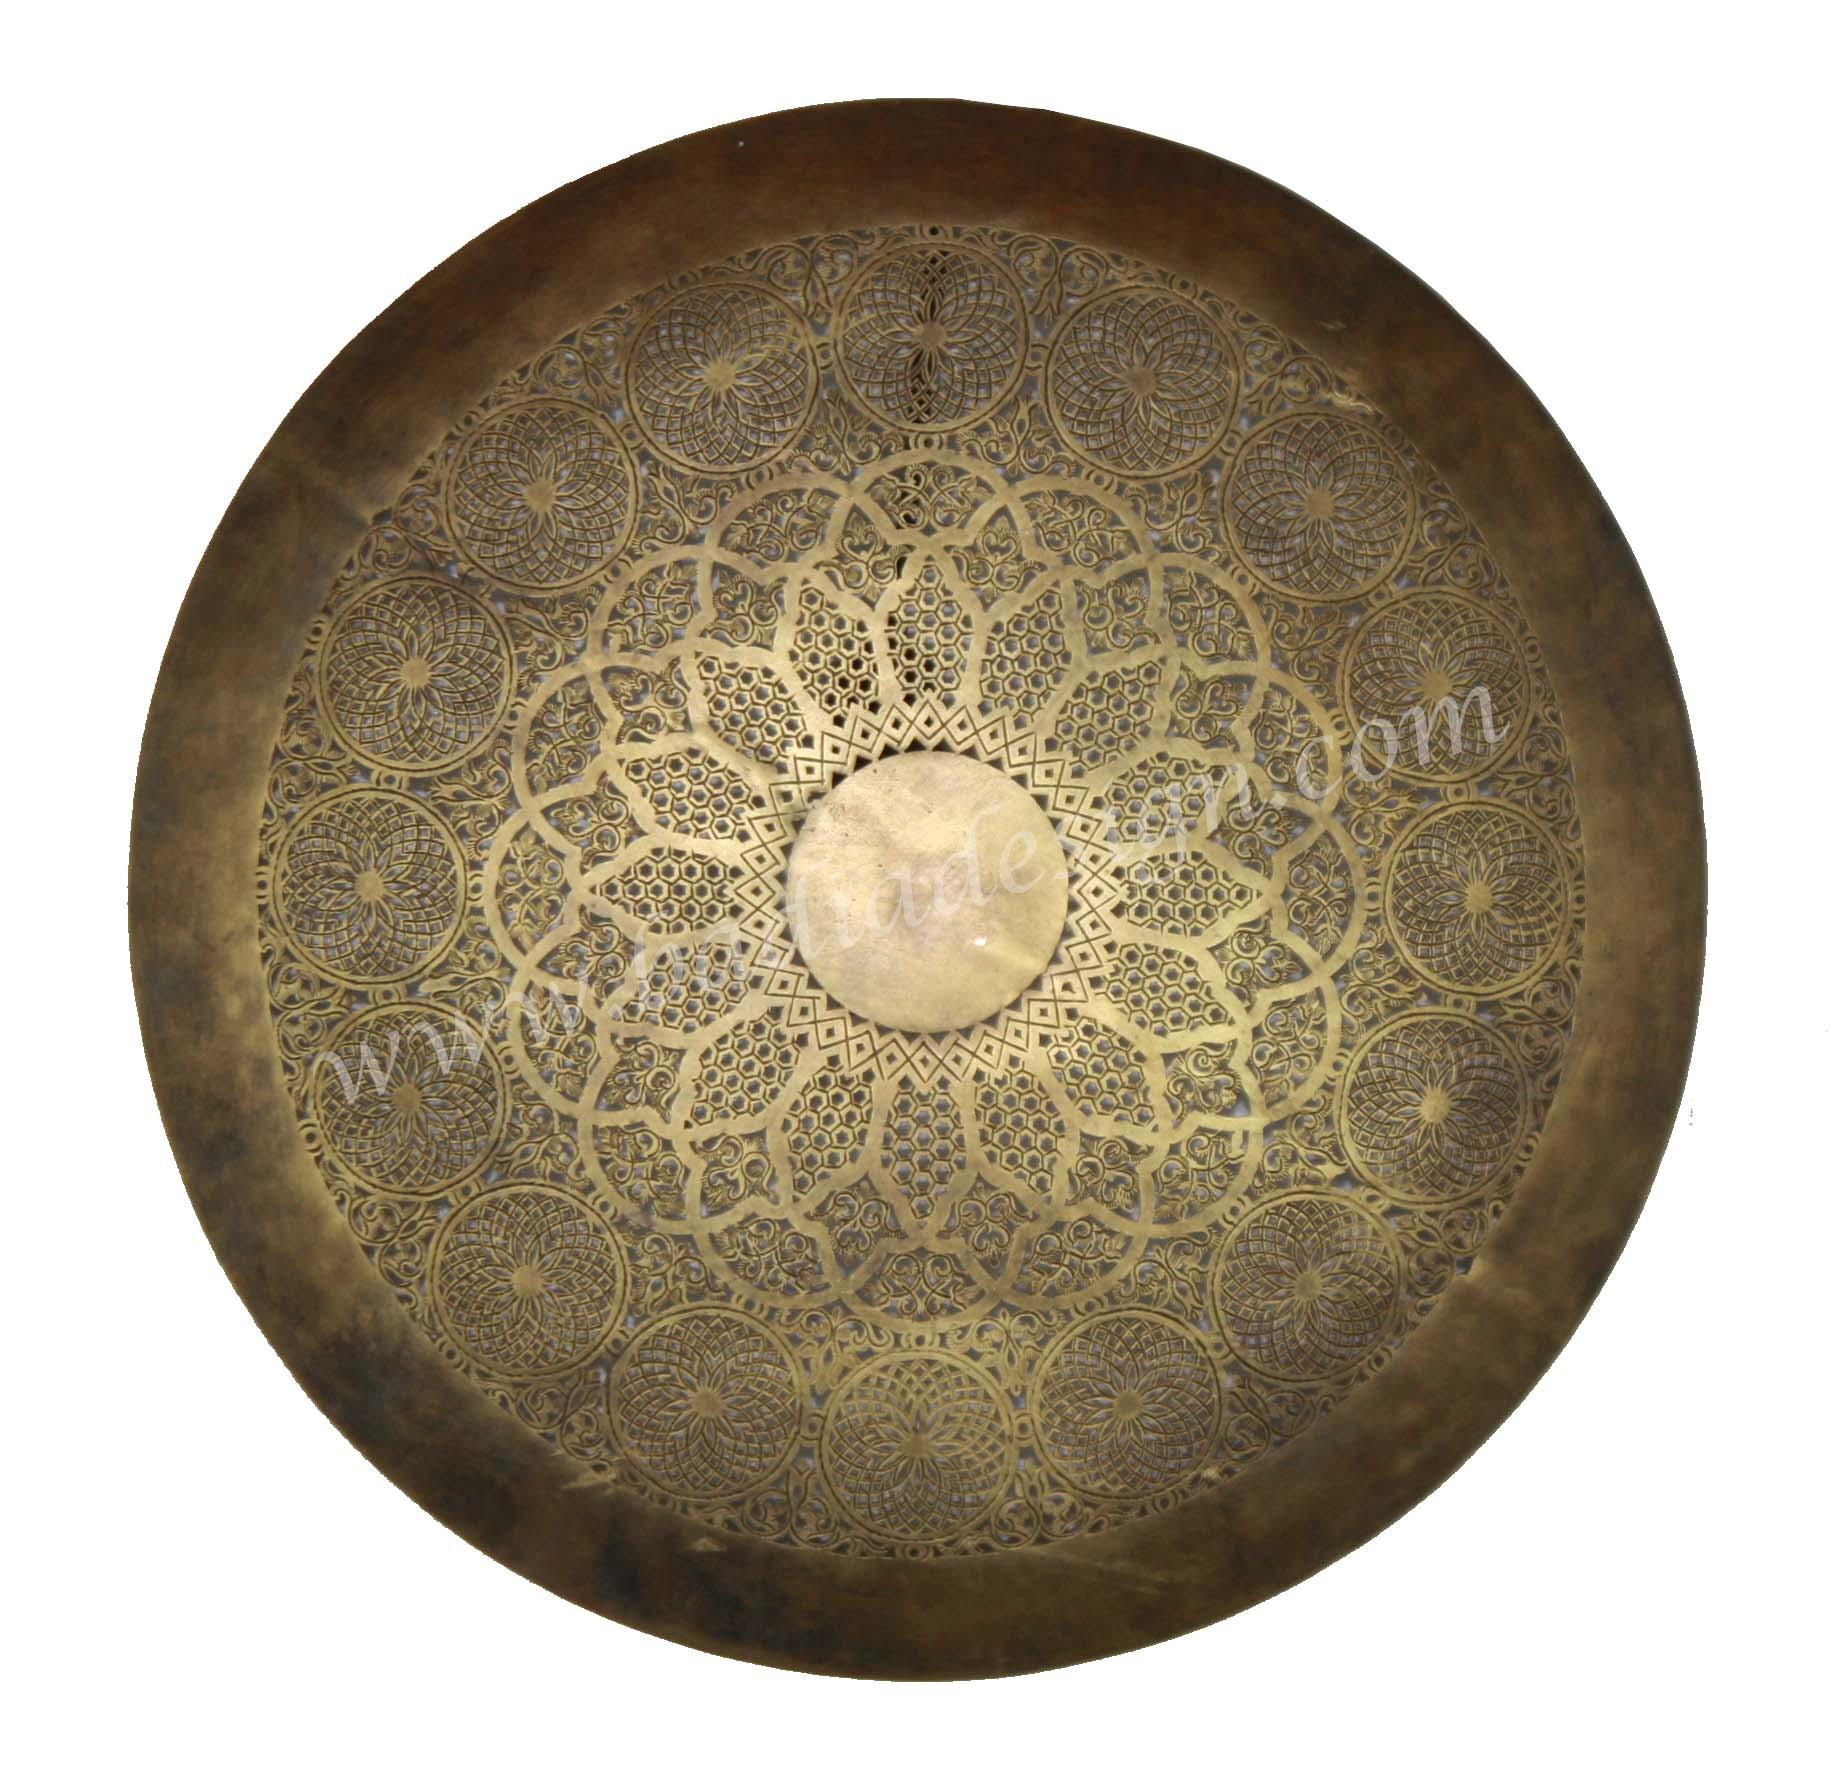 moroccan-round-modern-brass-wall-sconce-wl207-3.jpg